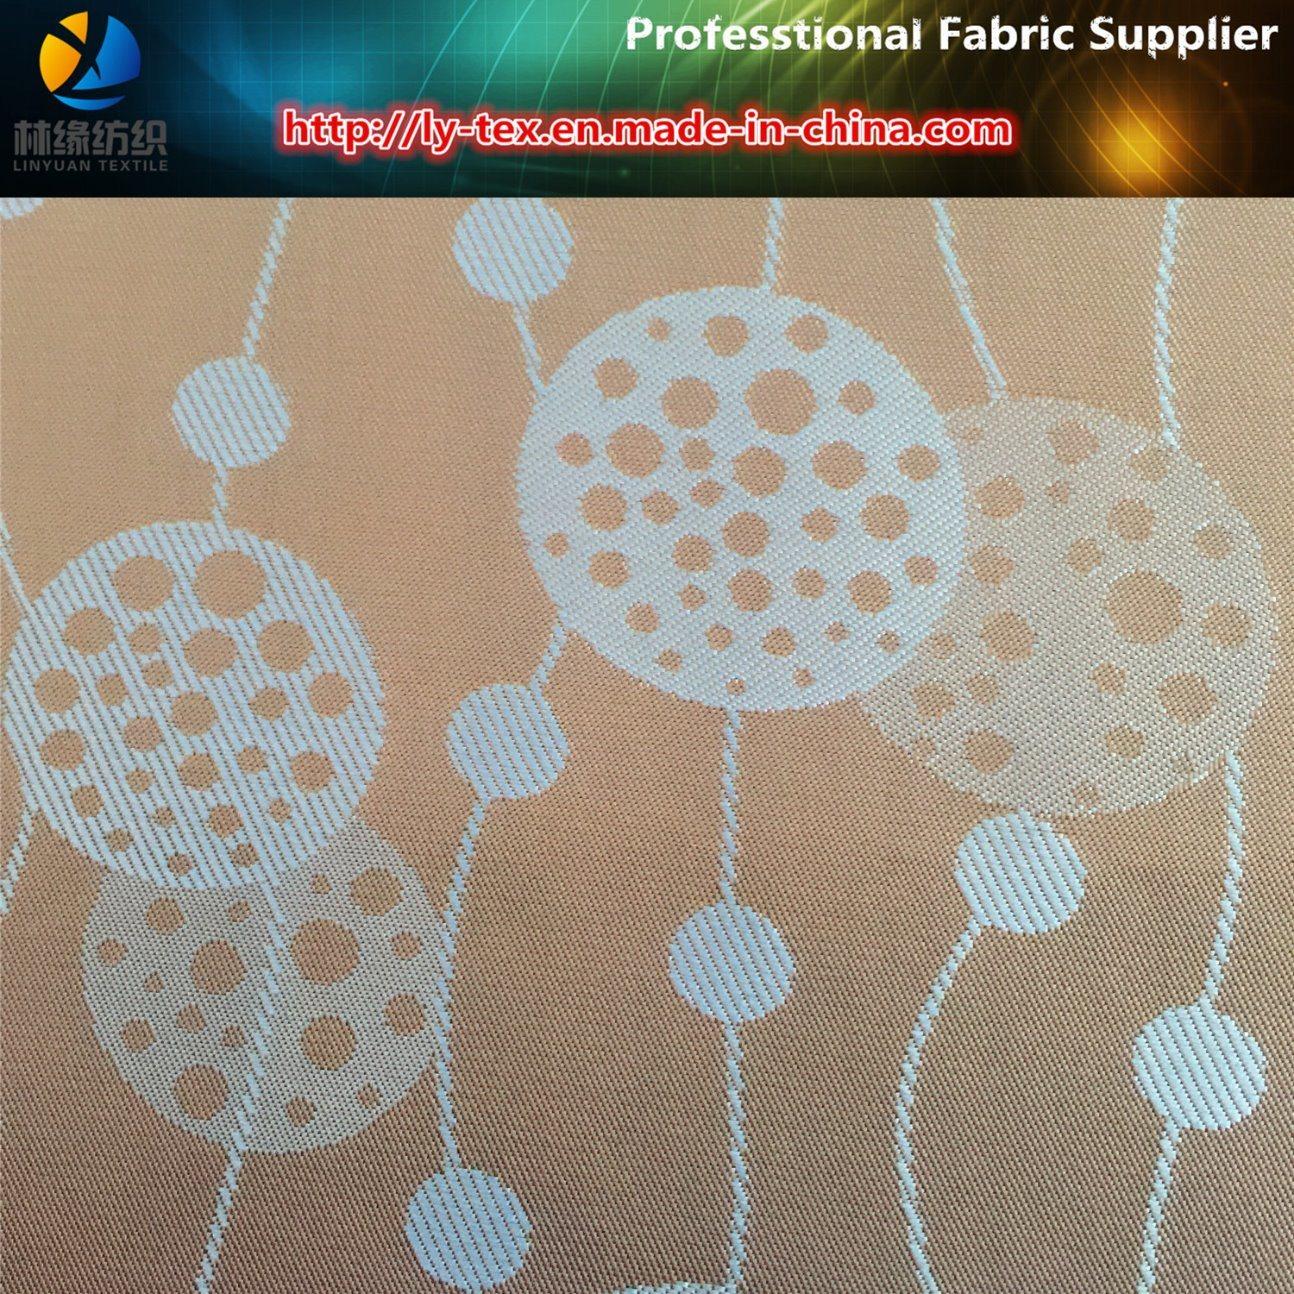 Polyester Fabric, Dandelion Jacquard, Twill Fabric, Lining Fabric (14)